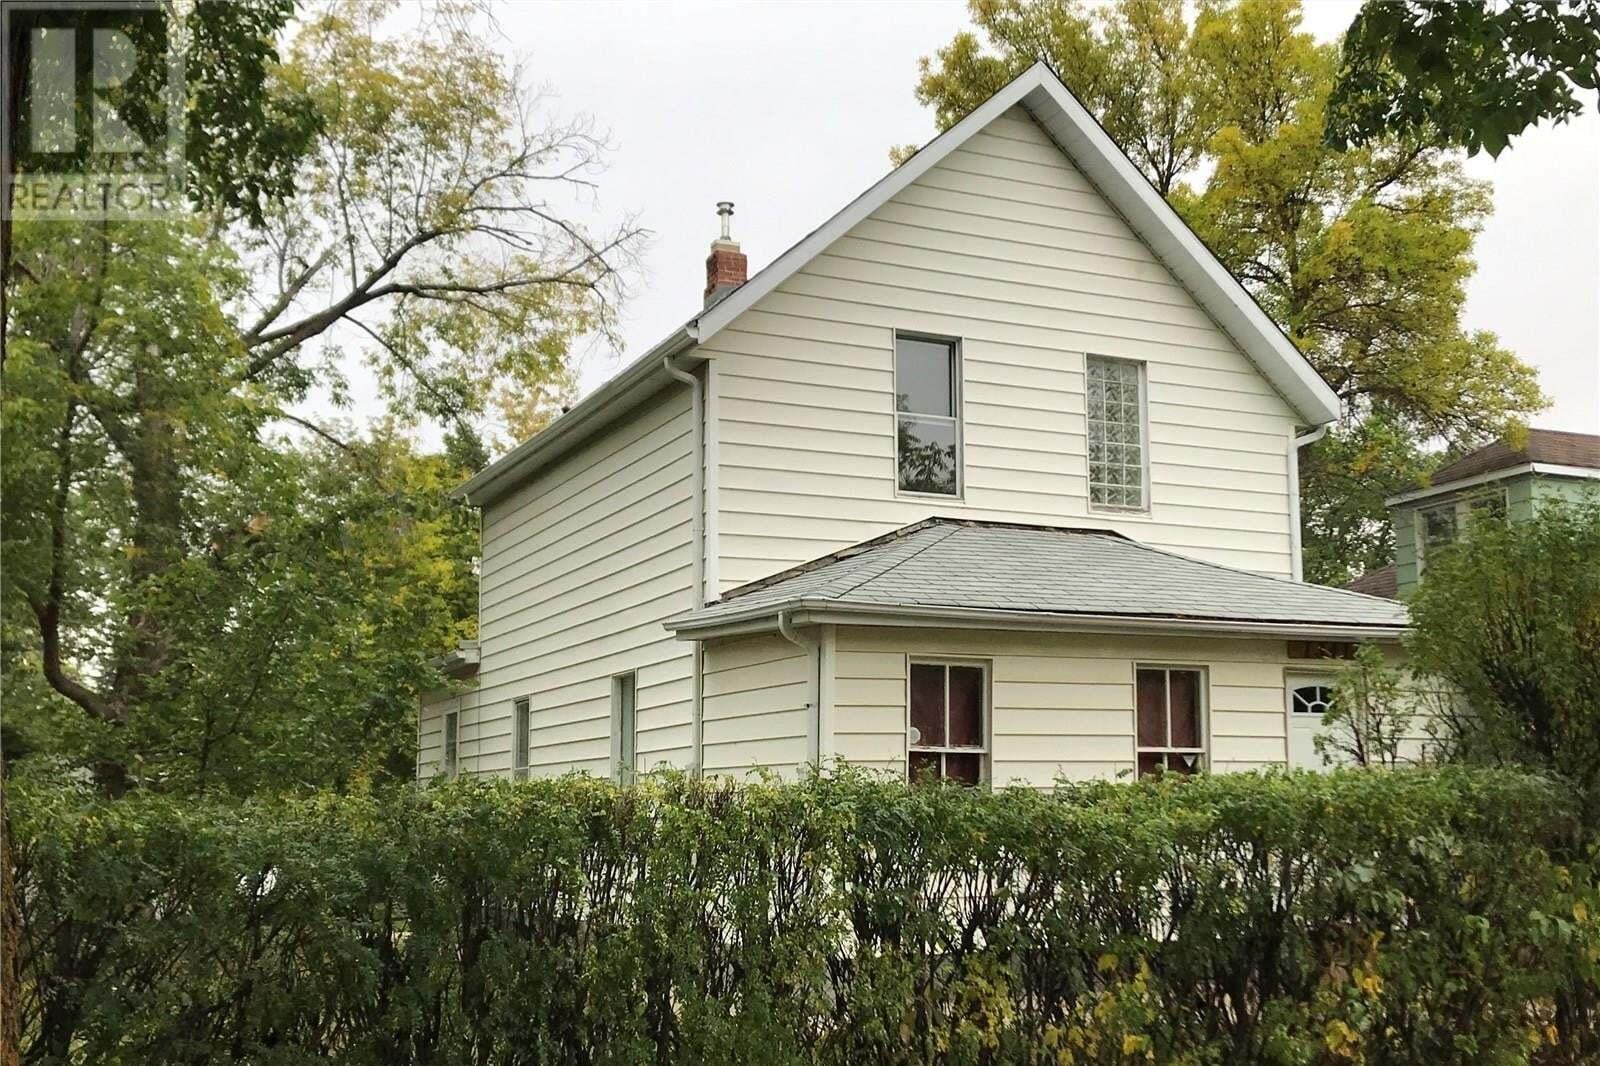 House for sale at 1341 98th St North Battleford Saskatchewan - MLS: SK827316